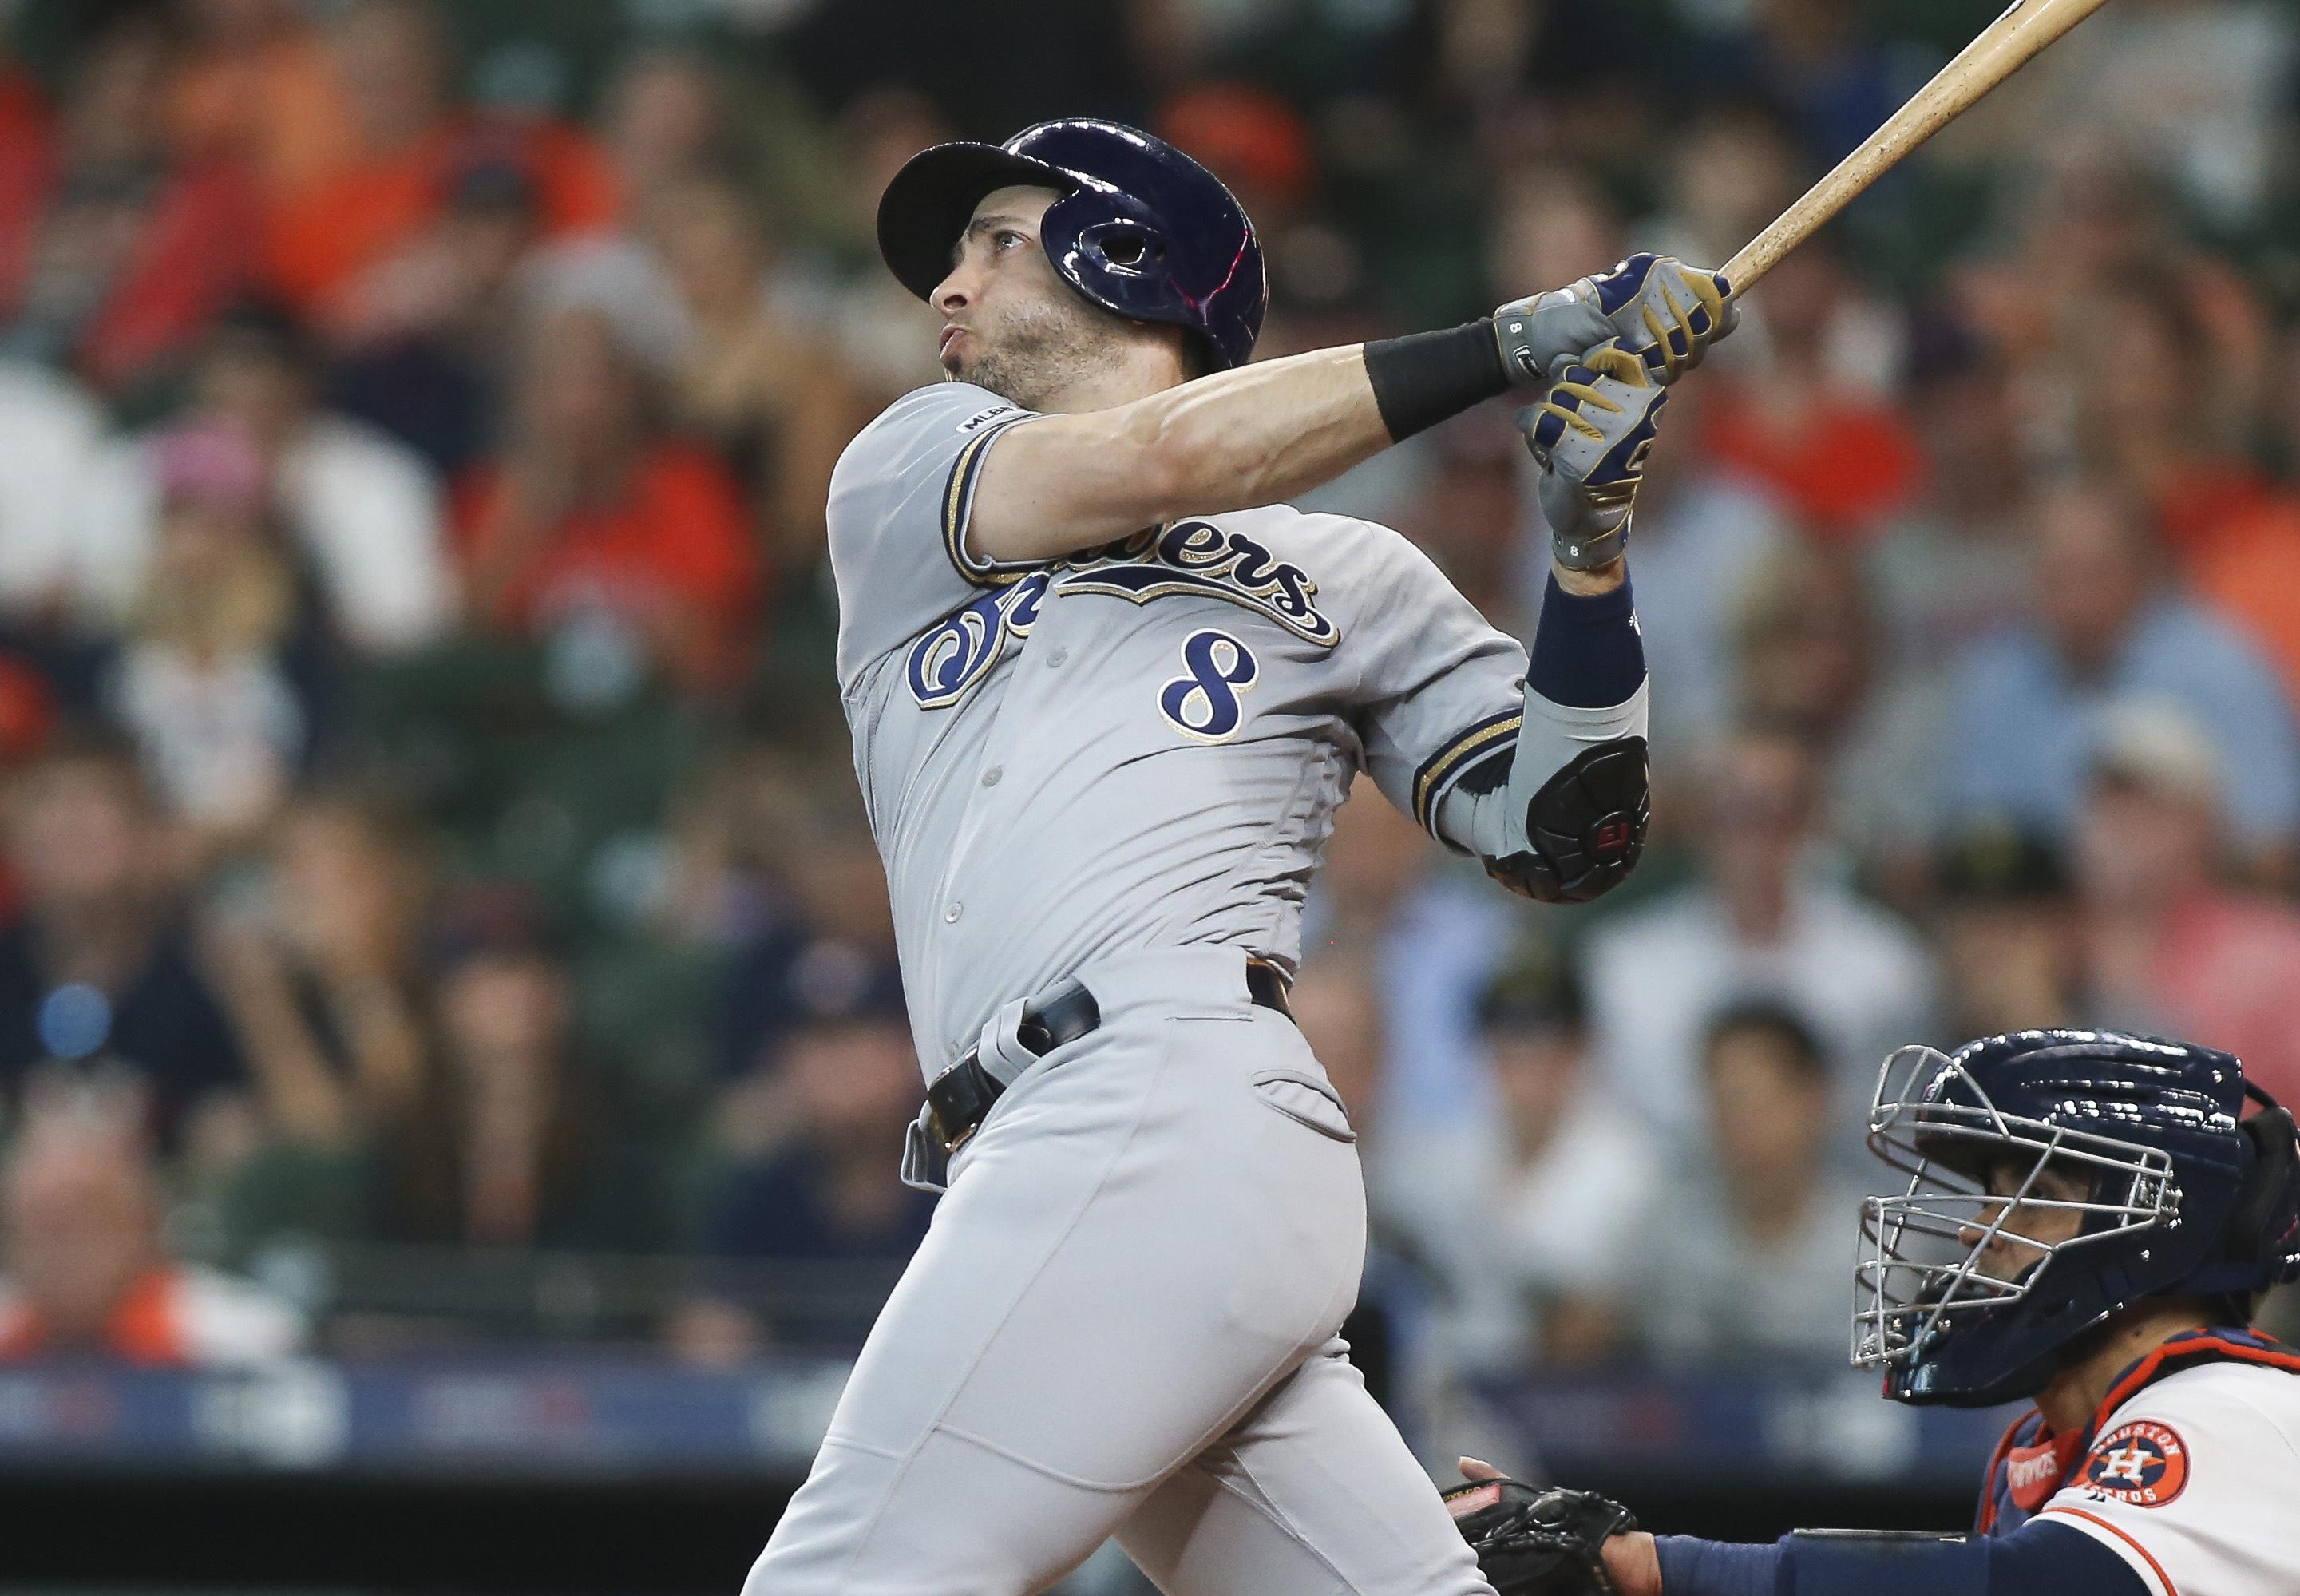 MLB: Milwaukee Brewers at Houston Astros